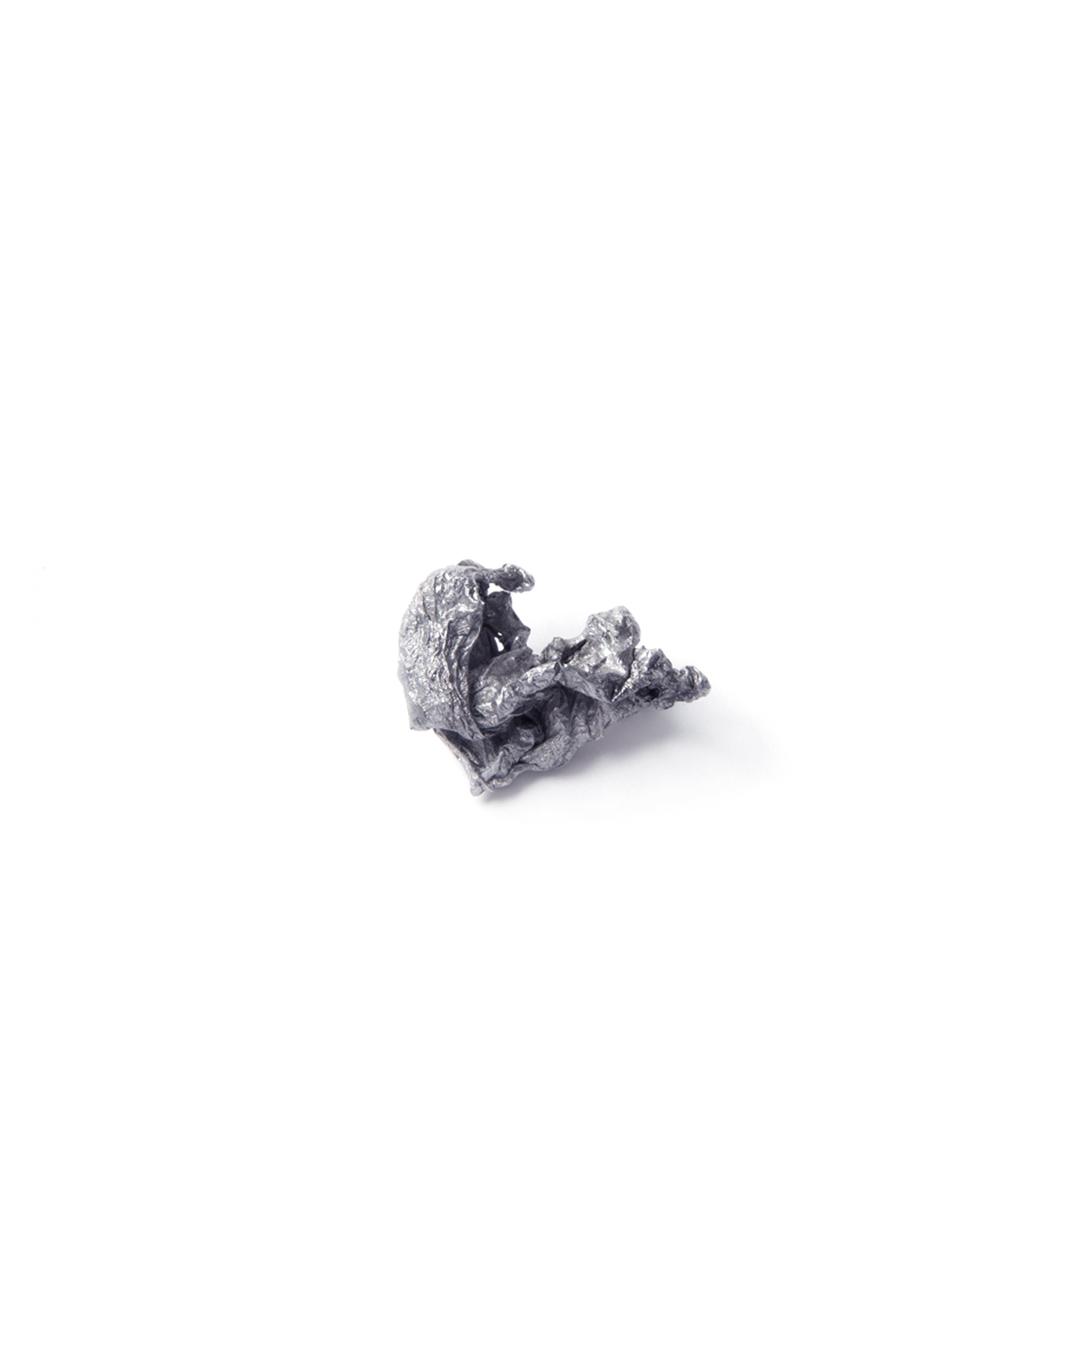 Barbara Schrobenhauser, Burnt Secret, 2015,  brooch; aluminium, stainless steel, 35 x 25 x 20 mm, €390